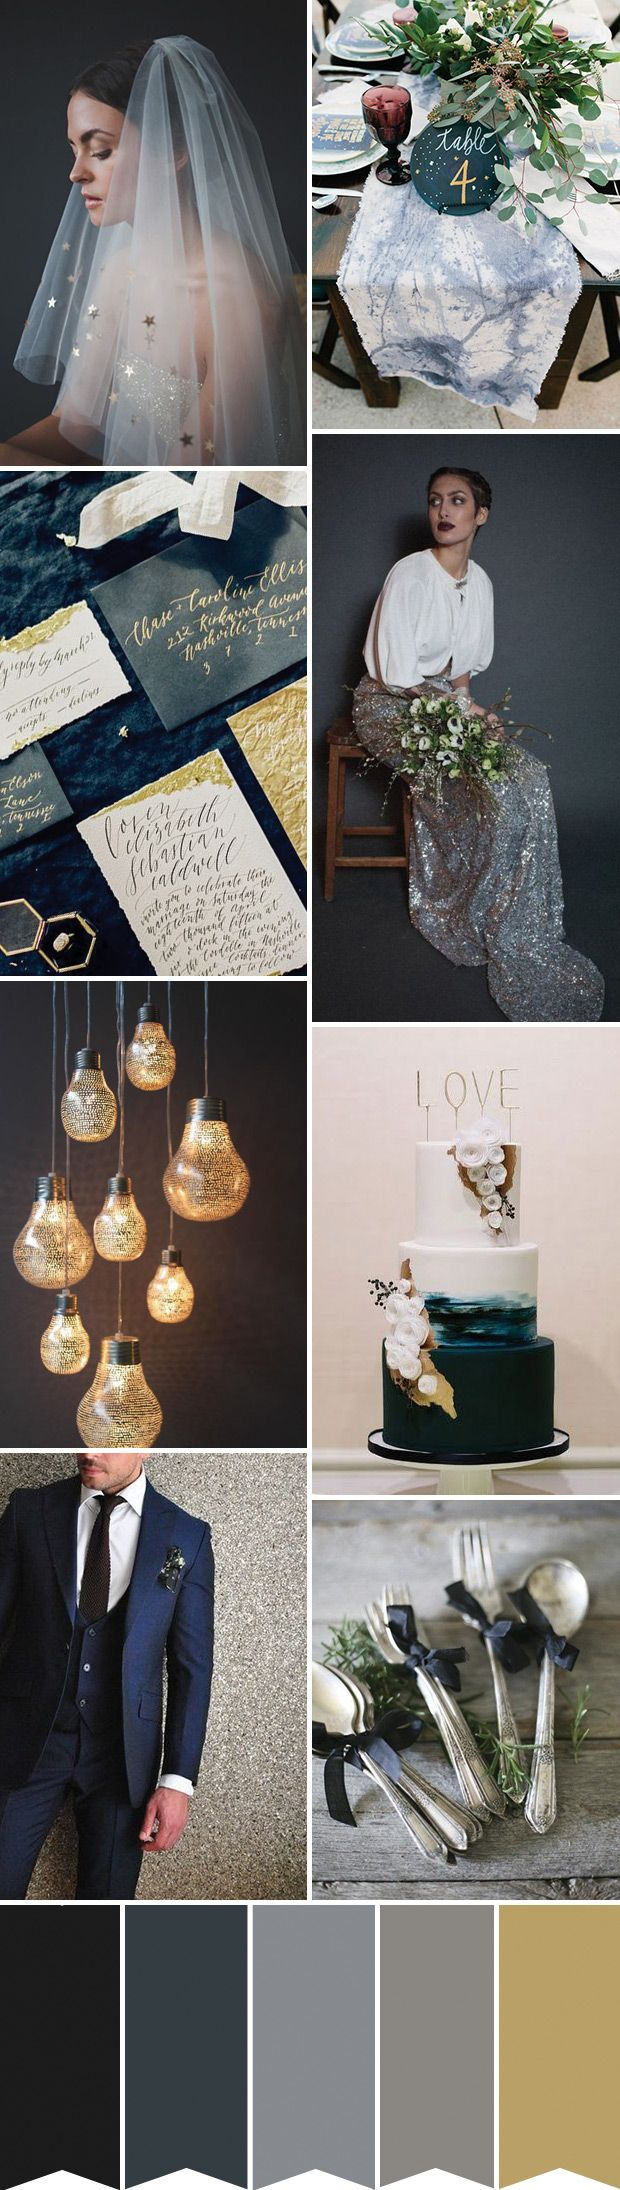 Navy, Black and Sparkle Wedding Inspiration - a dreamy dark colour palette inspired by a sparkling midnight sky...